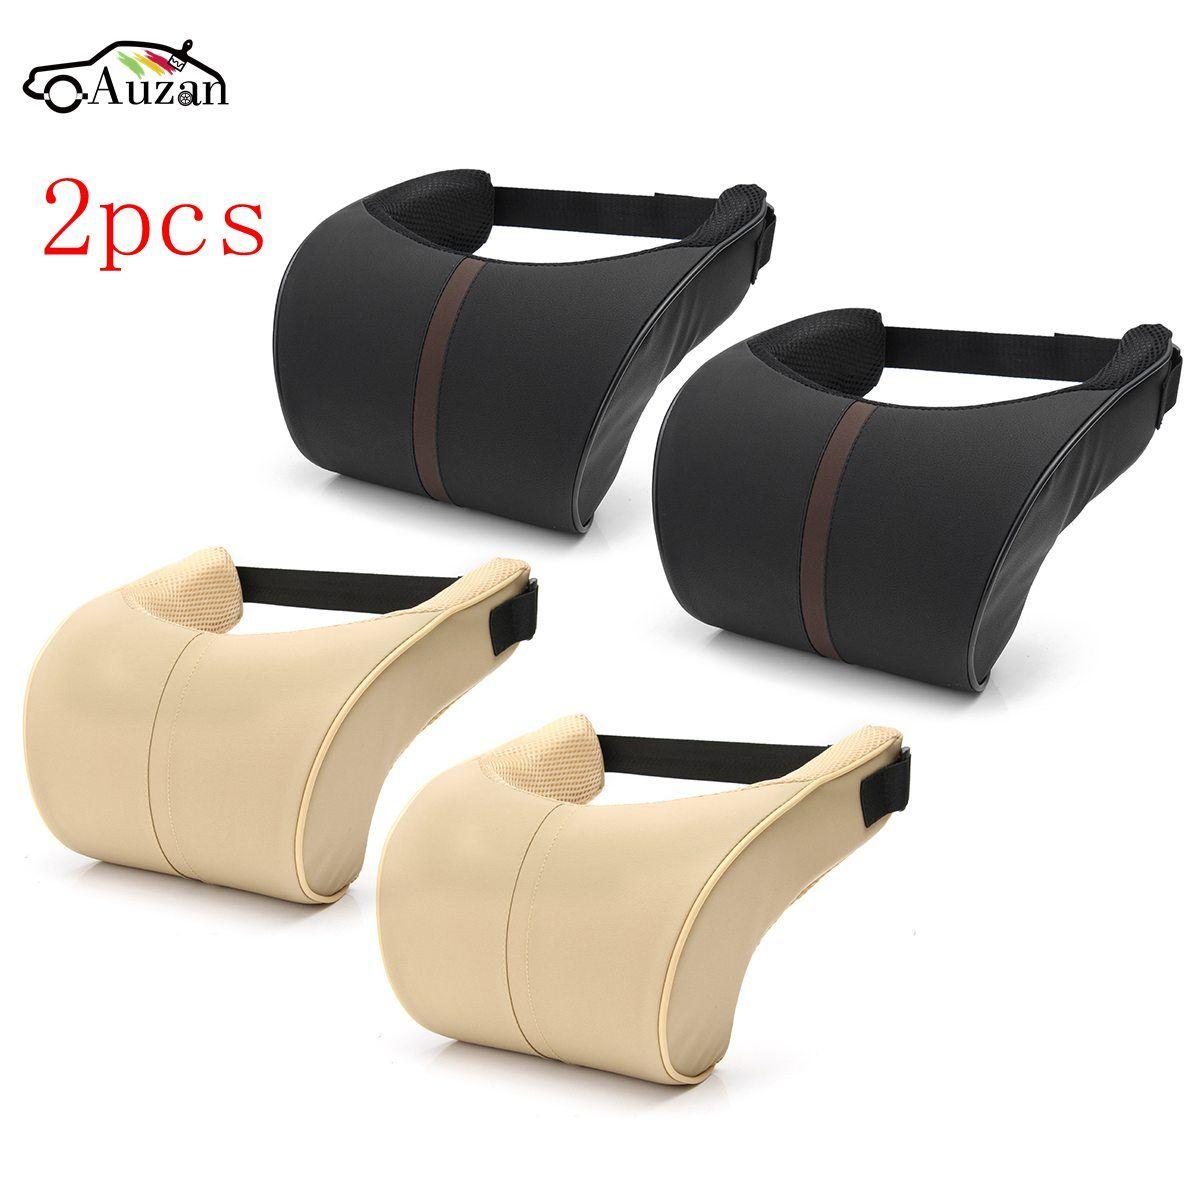 2x Car Seat Neck Pillow PU Leather Ergonomic Seat Headrest Pad Auto Car Neck Rest Memory Foam Pillows